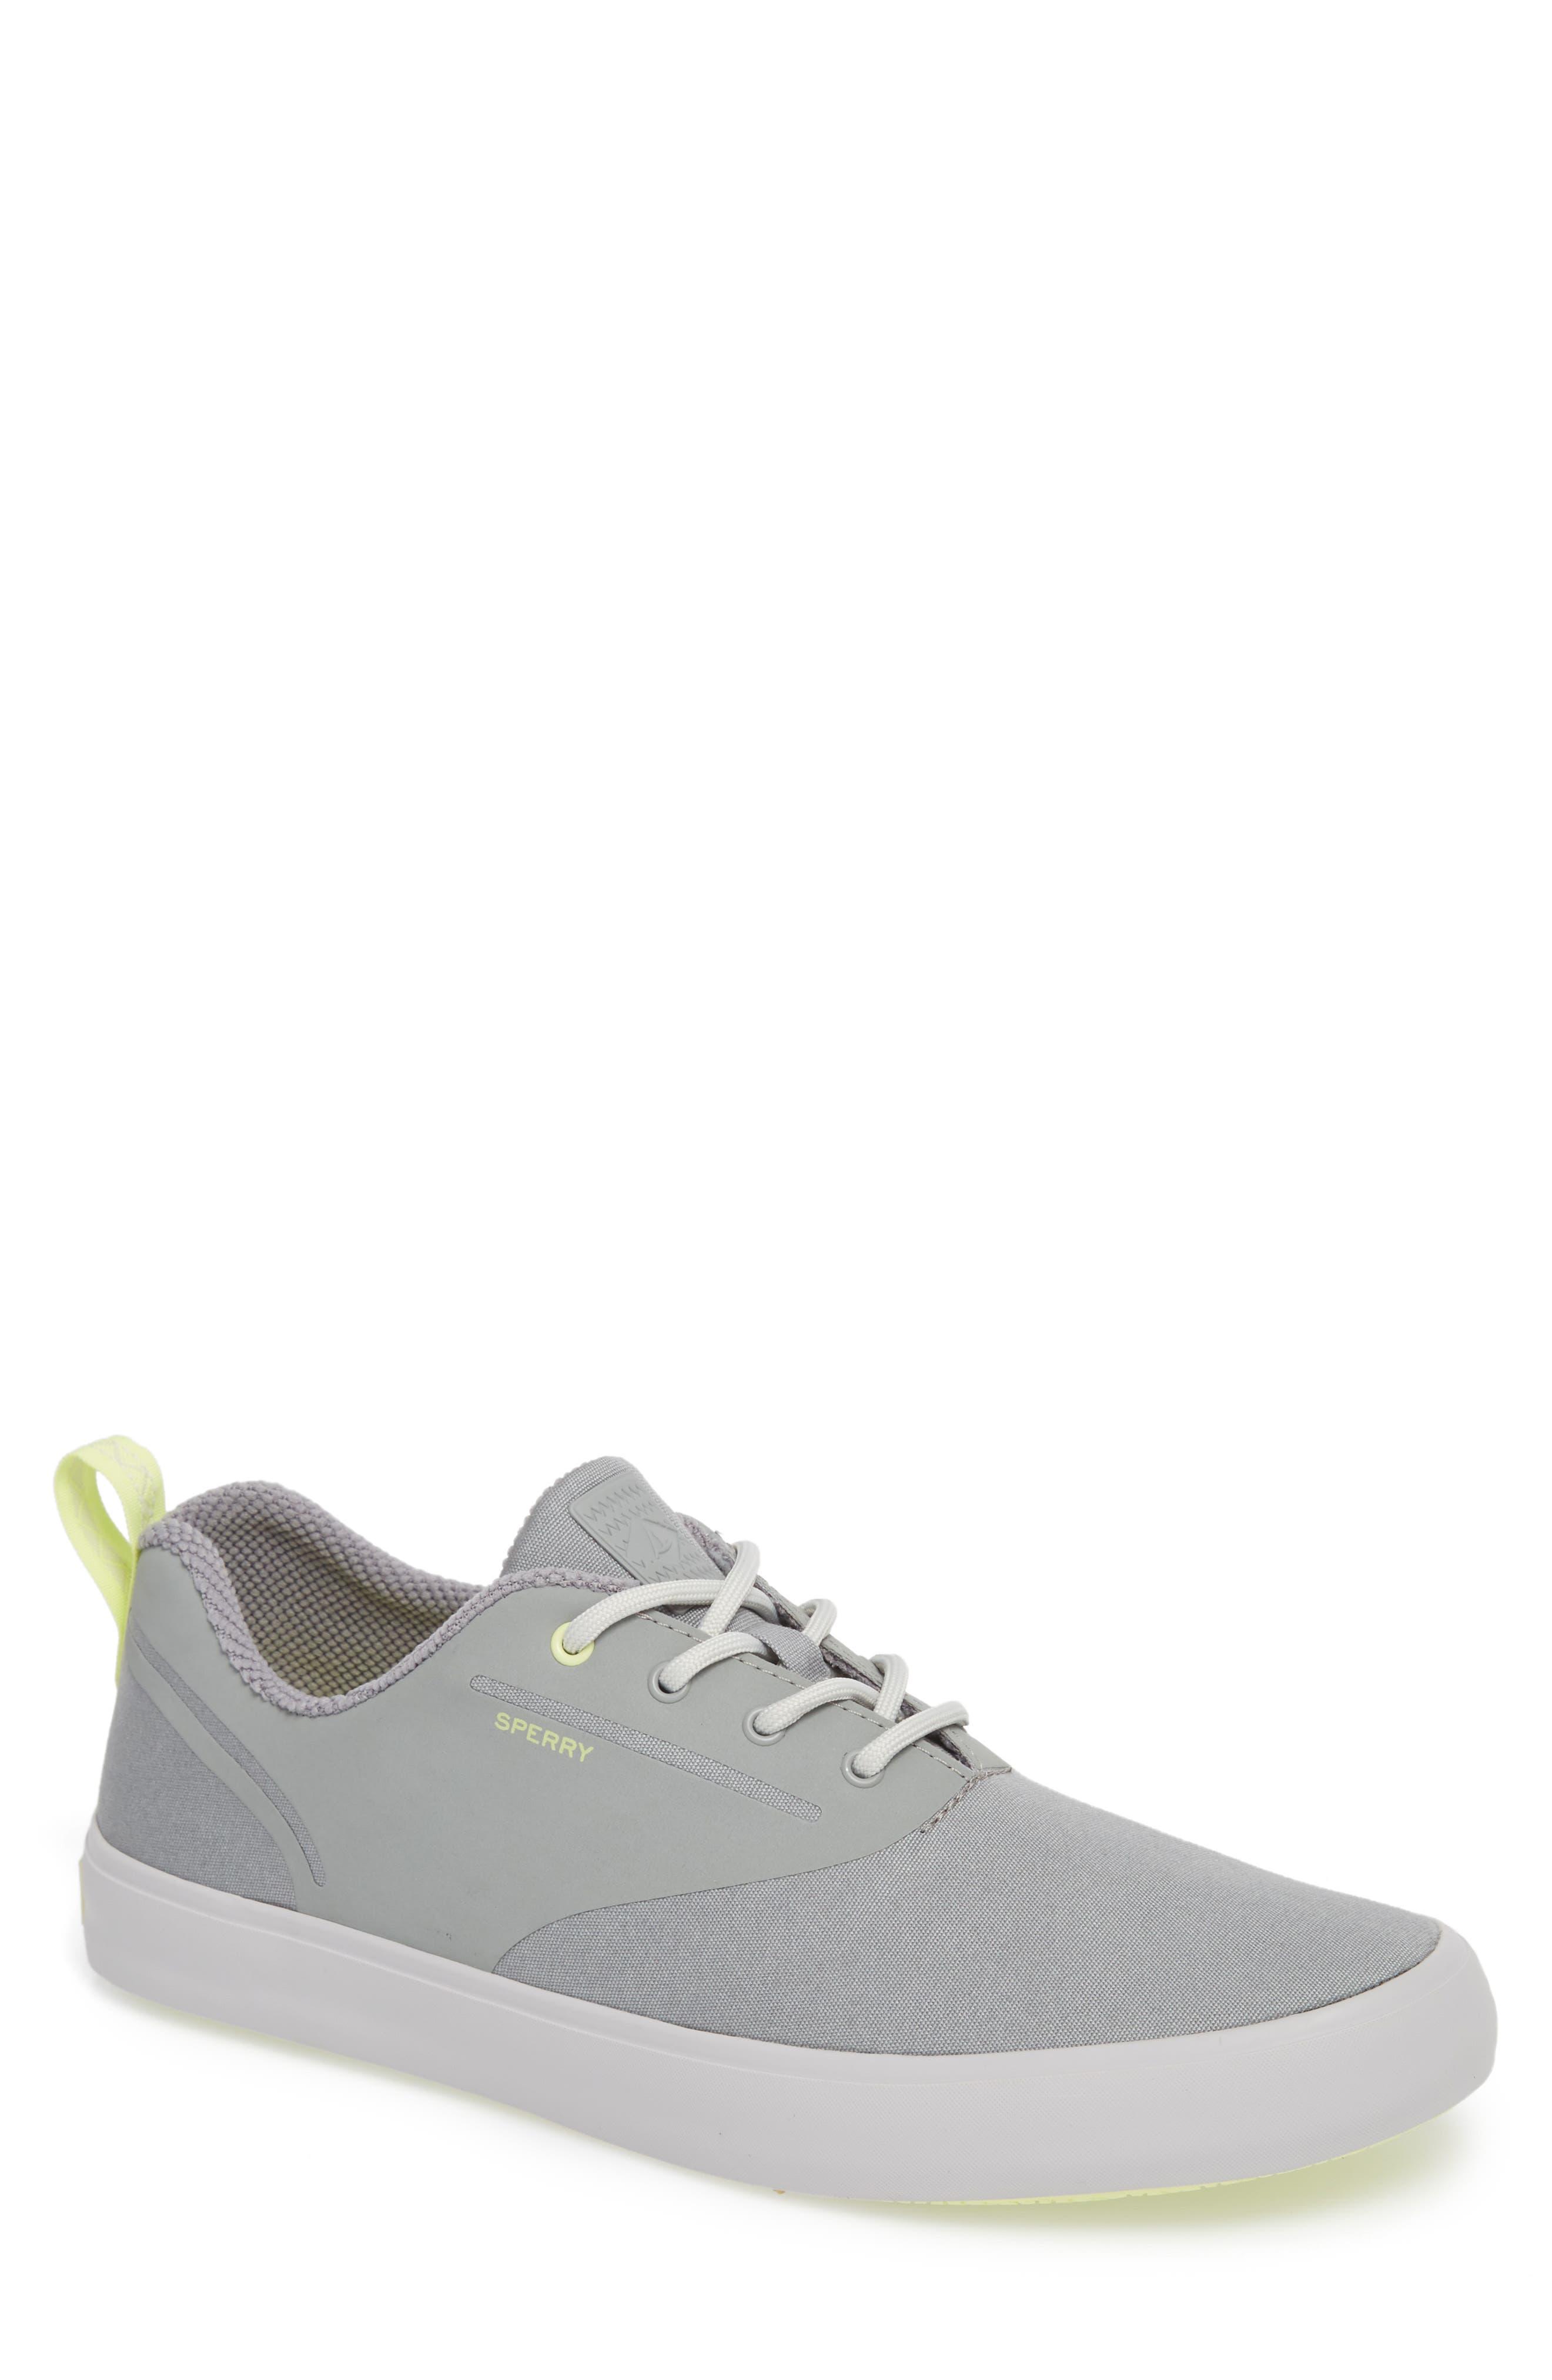 Flex Deck CVO Sneaker,                             Main thumbnail 1, color,                             GREY